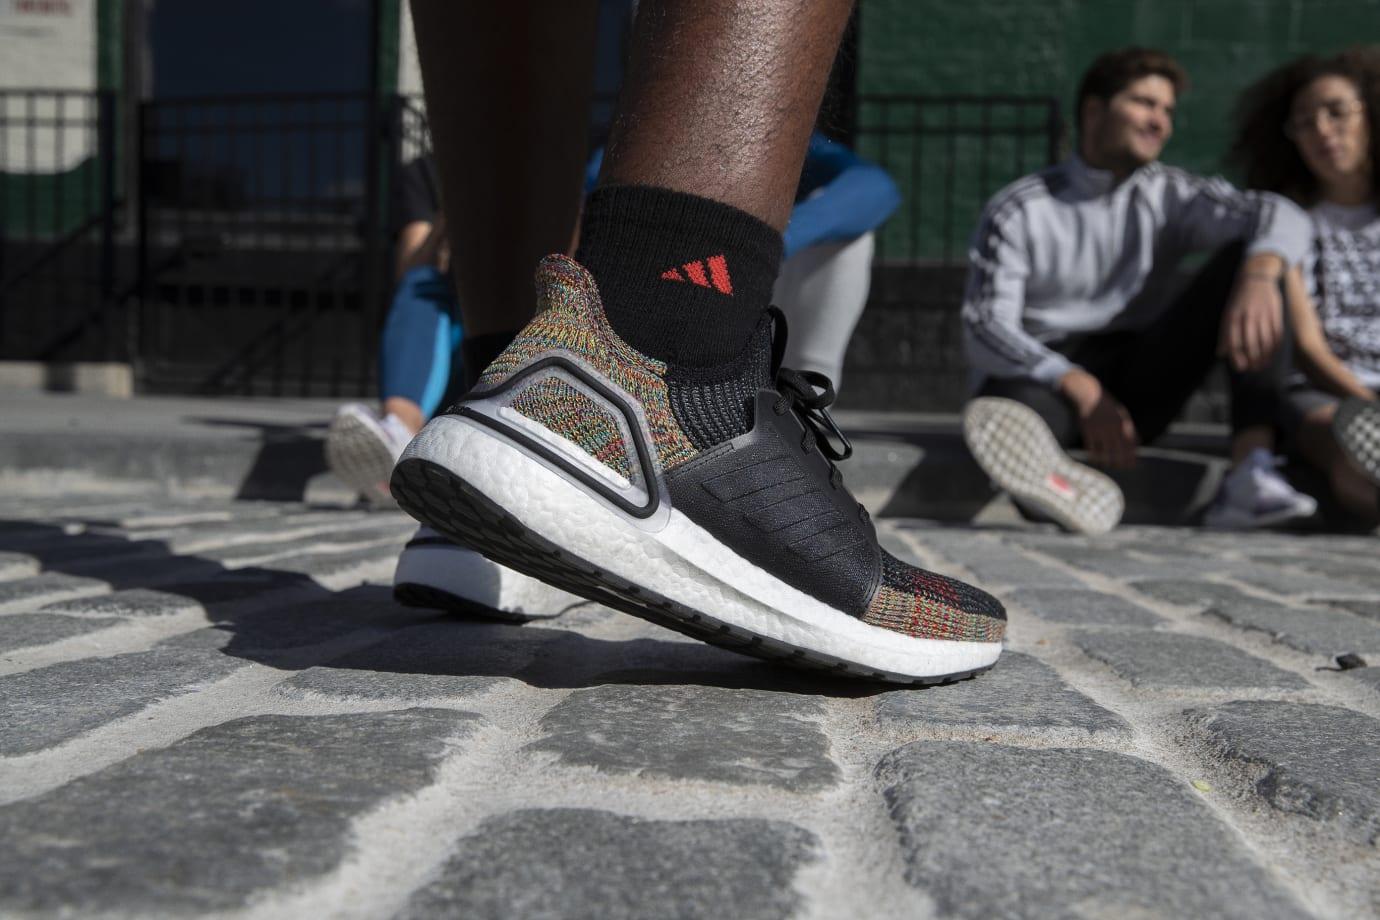 Adidas UltraBoost 19 'Dark Pixel' 3